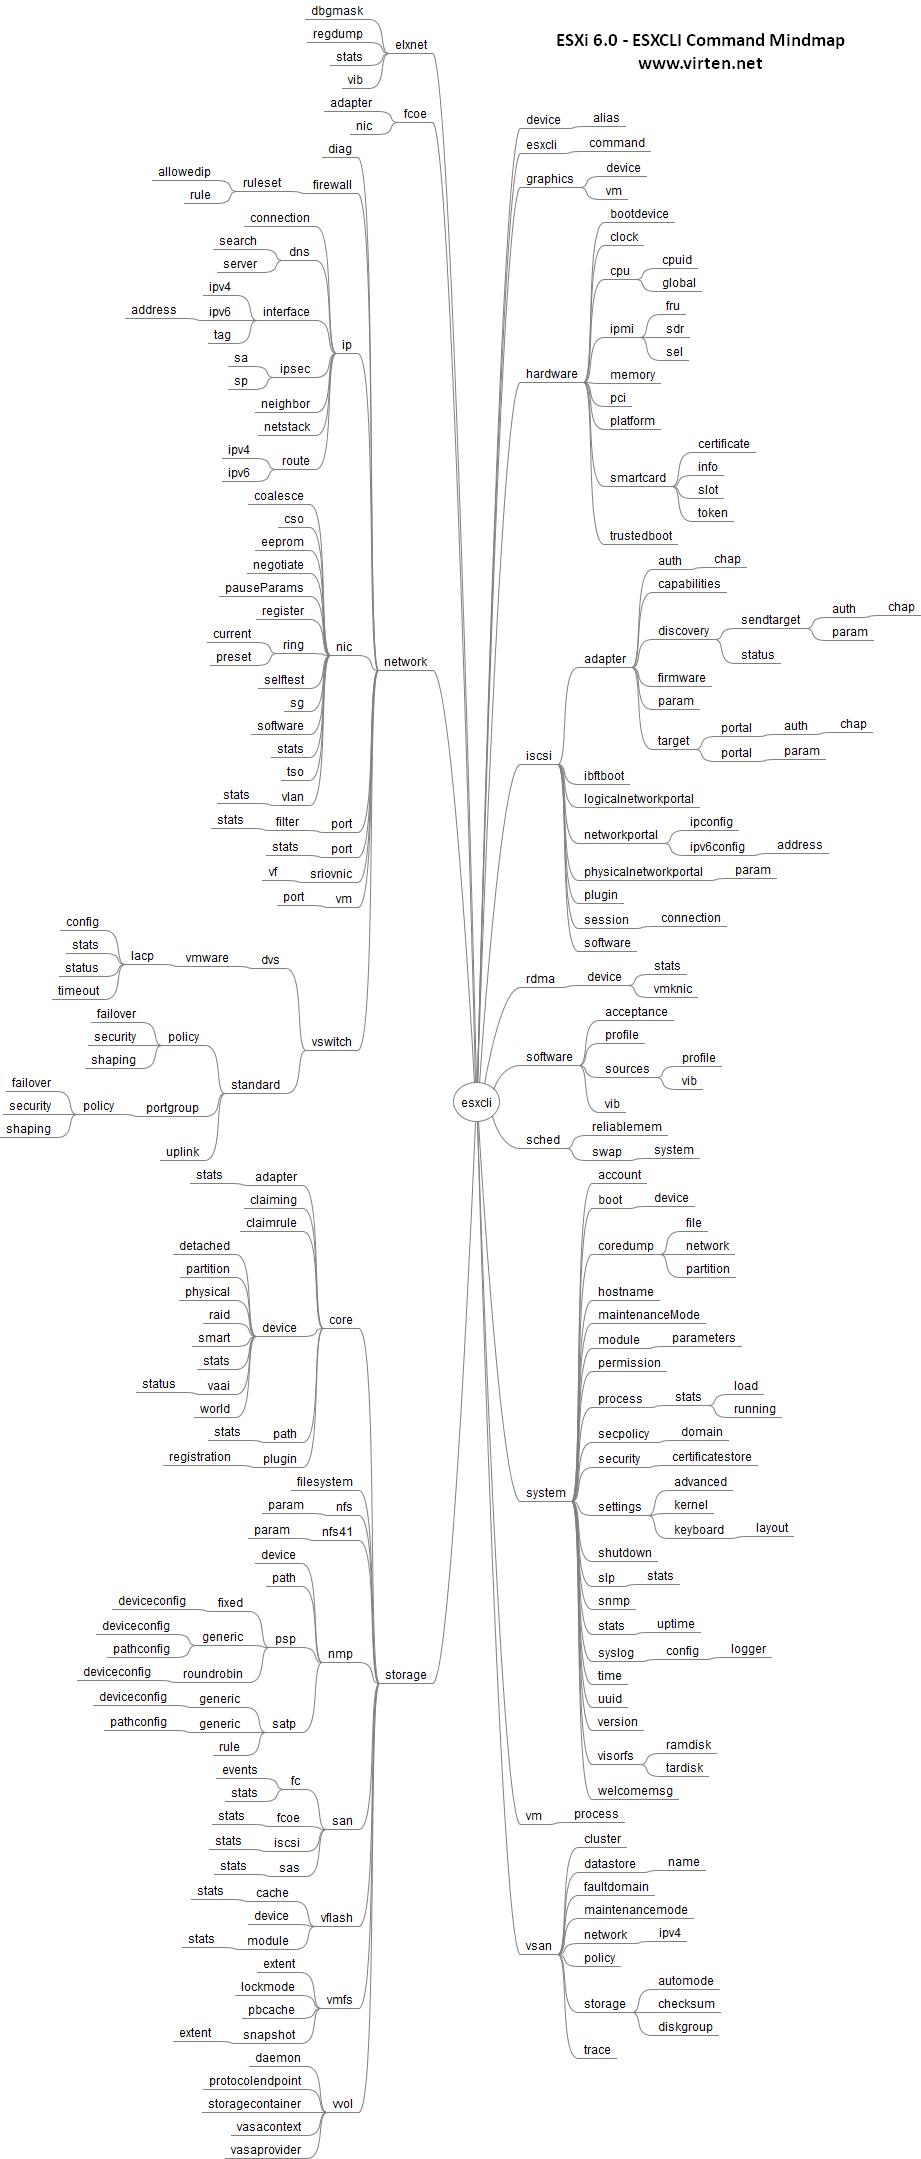 esxcli_60_command_mindmap